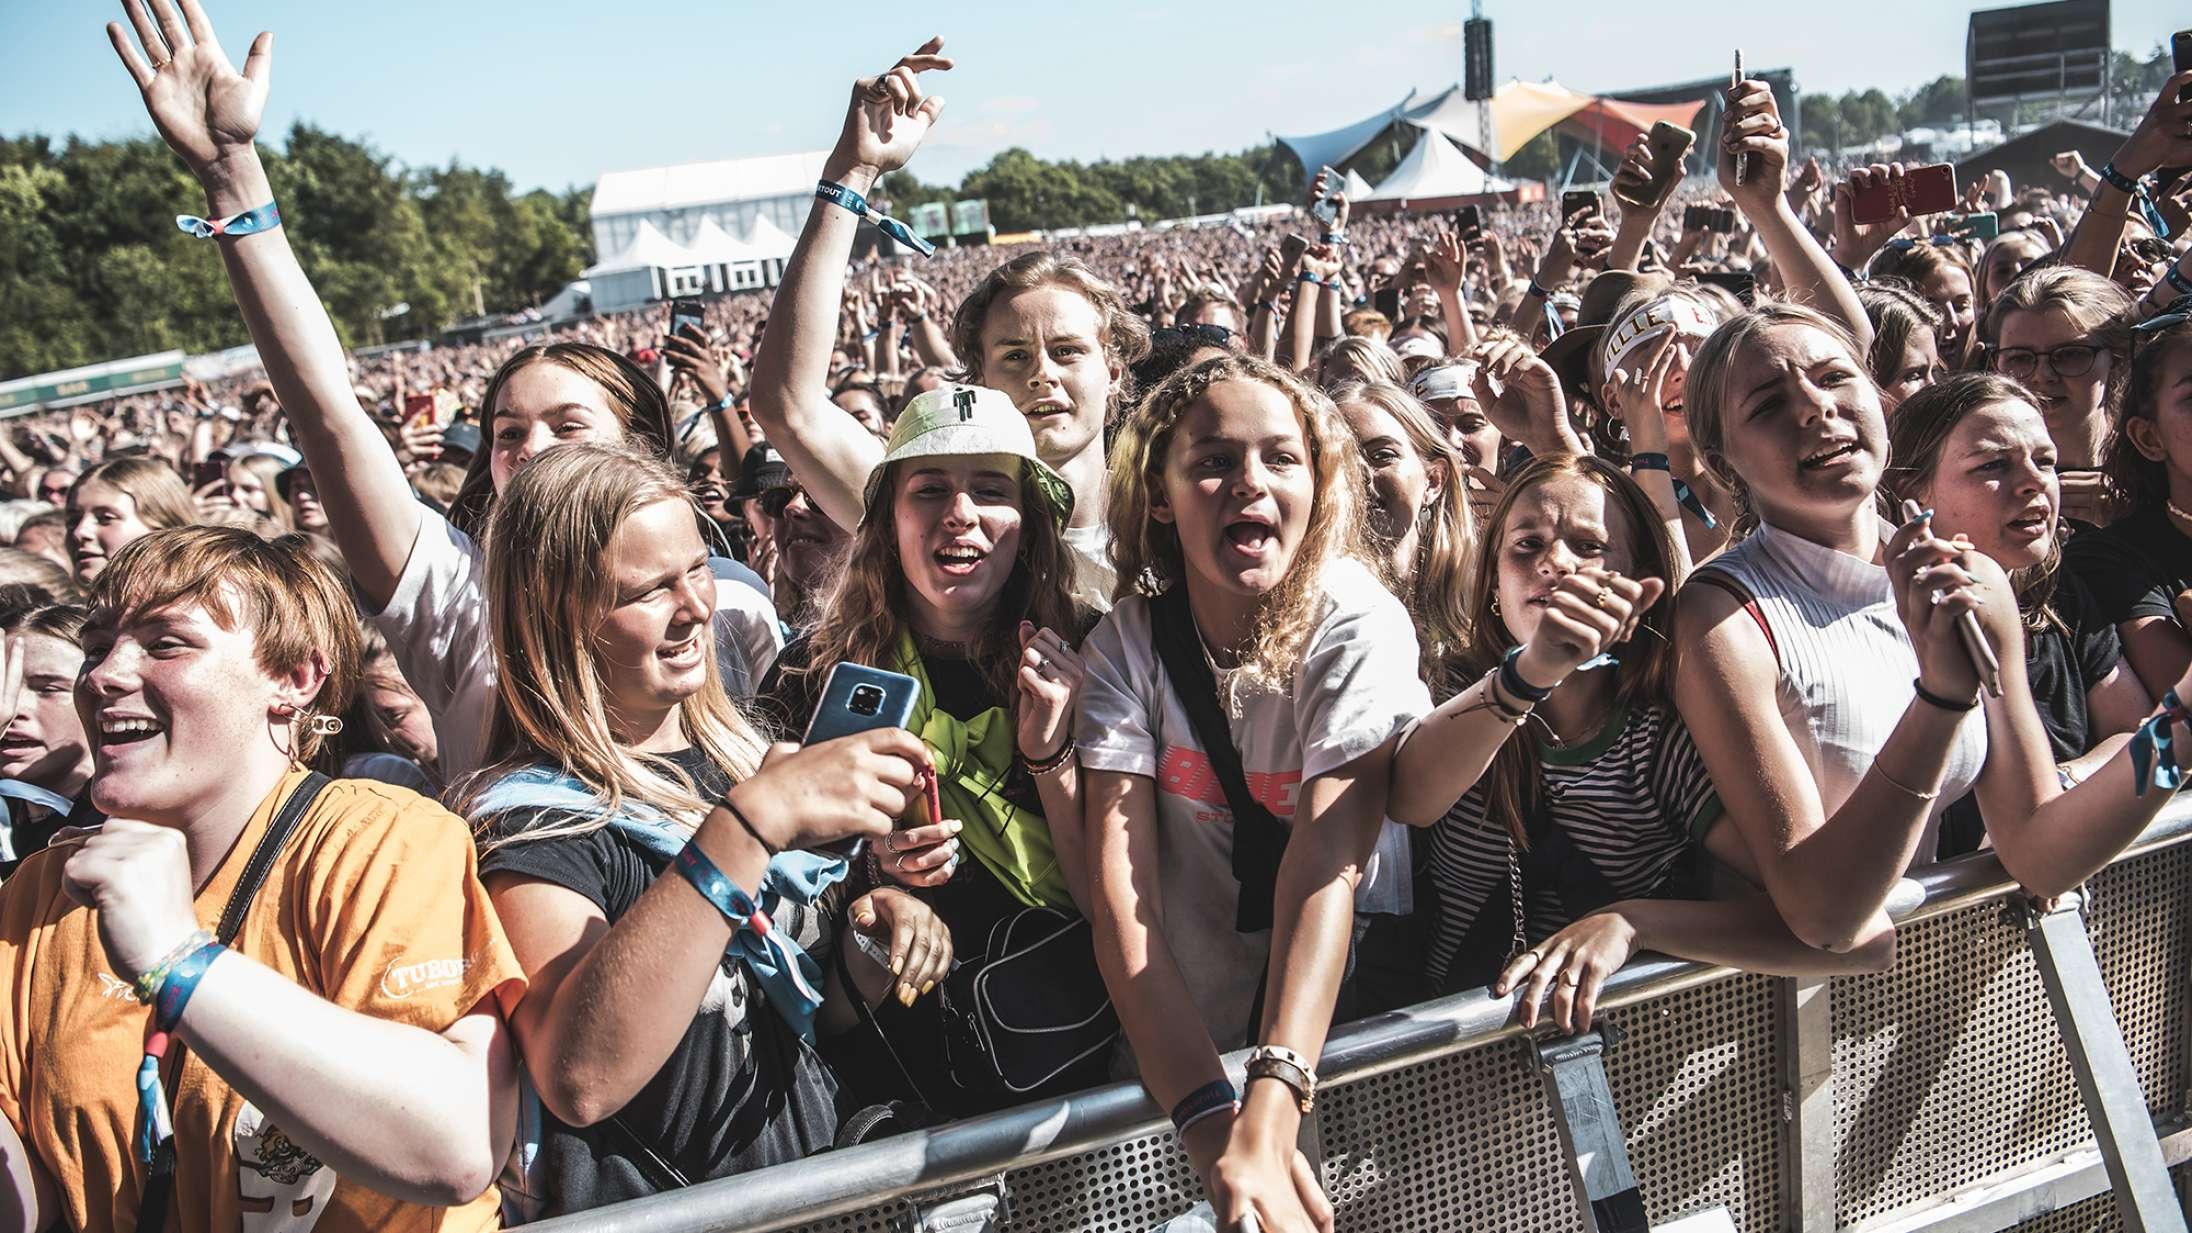 Kære pessimist: Derfor tror jeg på, at der kommer festivaler til sommer